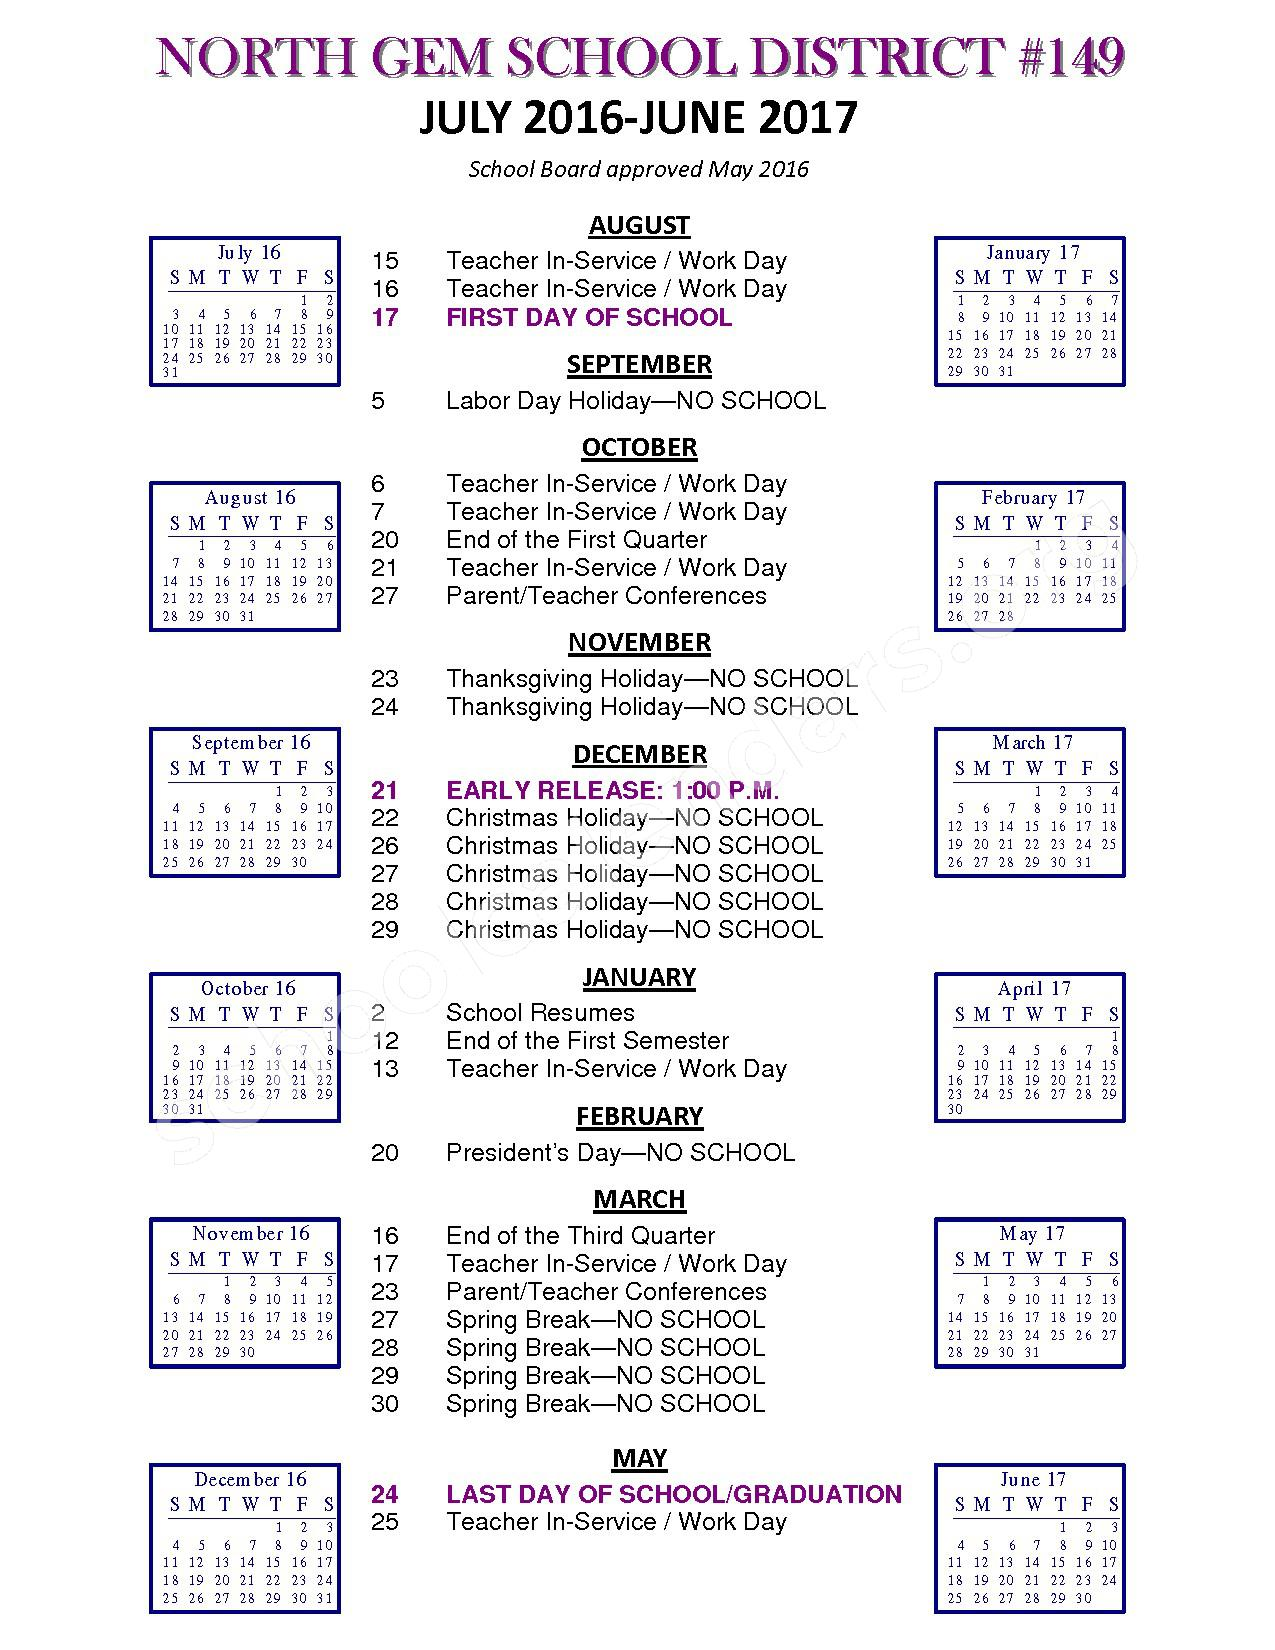 2016 - 2017 Year Calendar – North Gem School District 149 – page 1